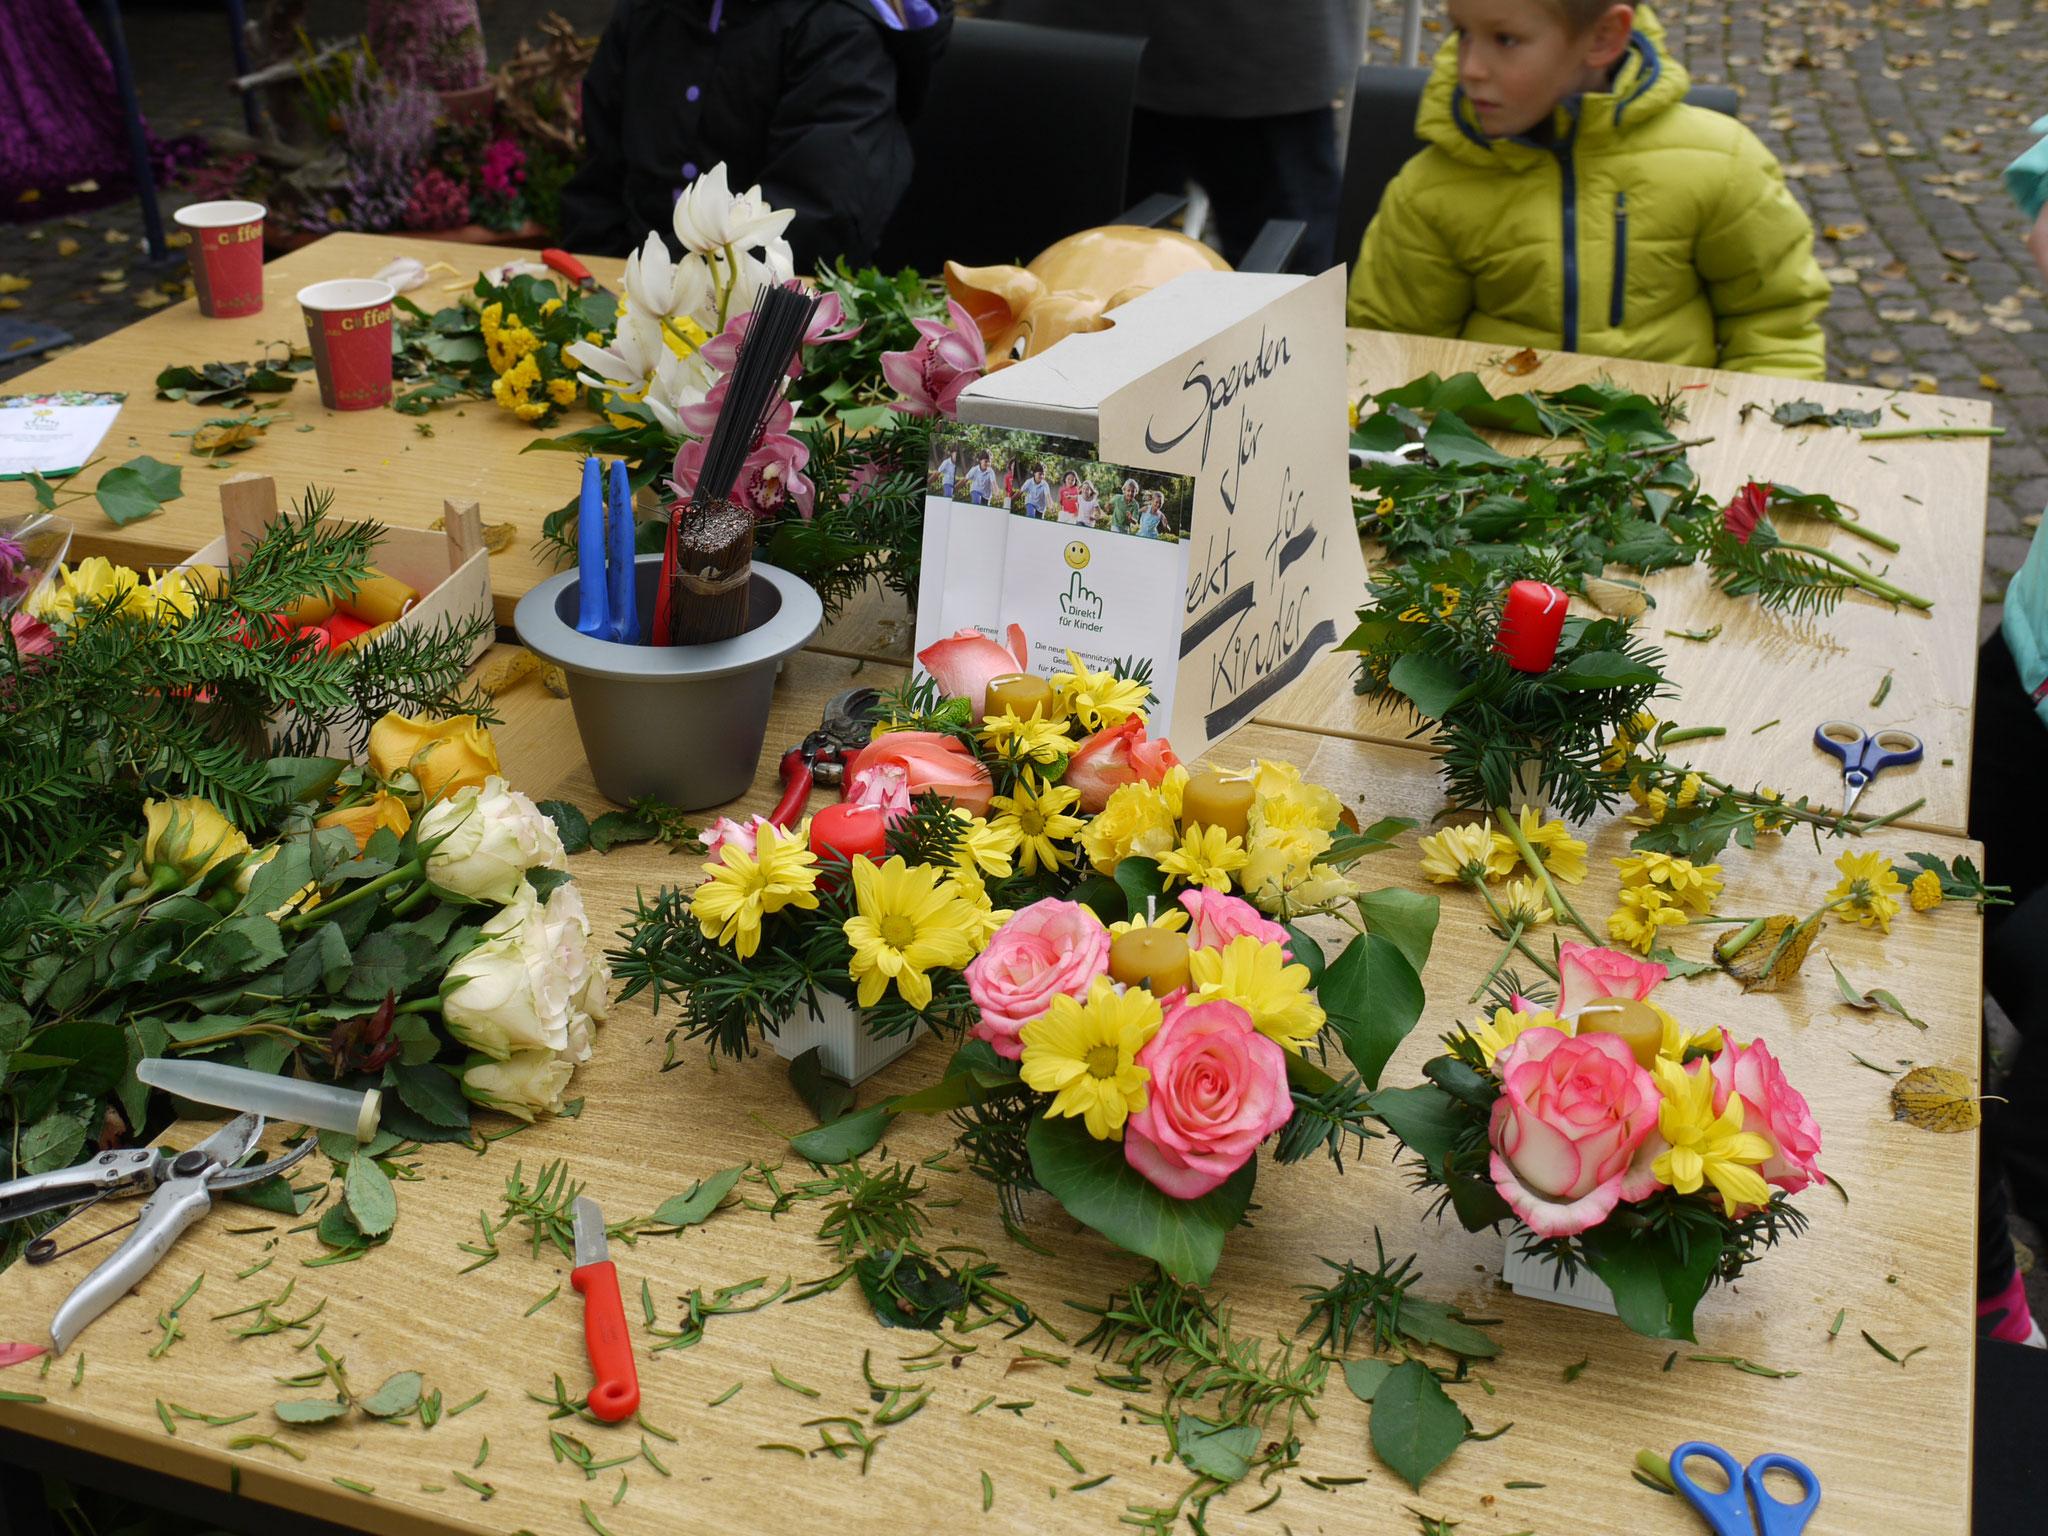 Blumenhäuser in Spenden-Aktion